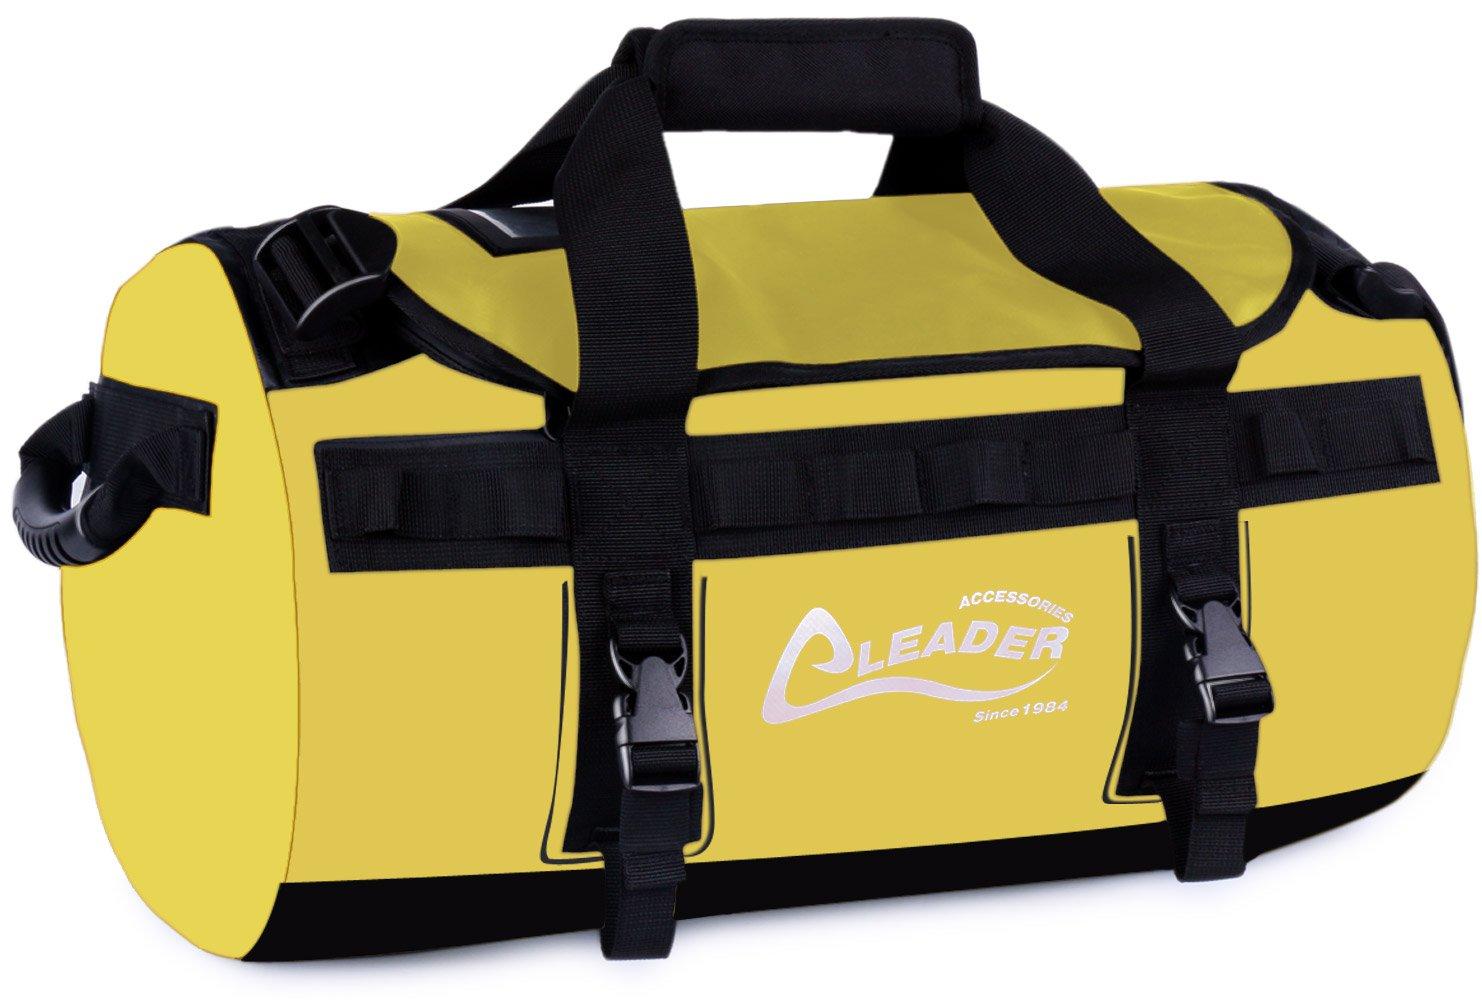 Leader Accessories Deluxe Water Resistant PVC Tarpaulin Duffel Bag Backpack(Yellow, 40L)